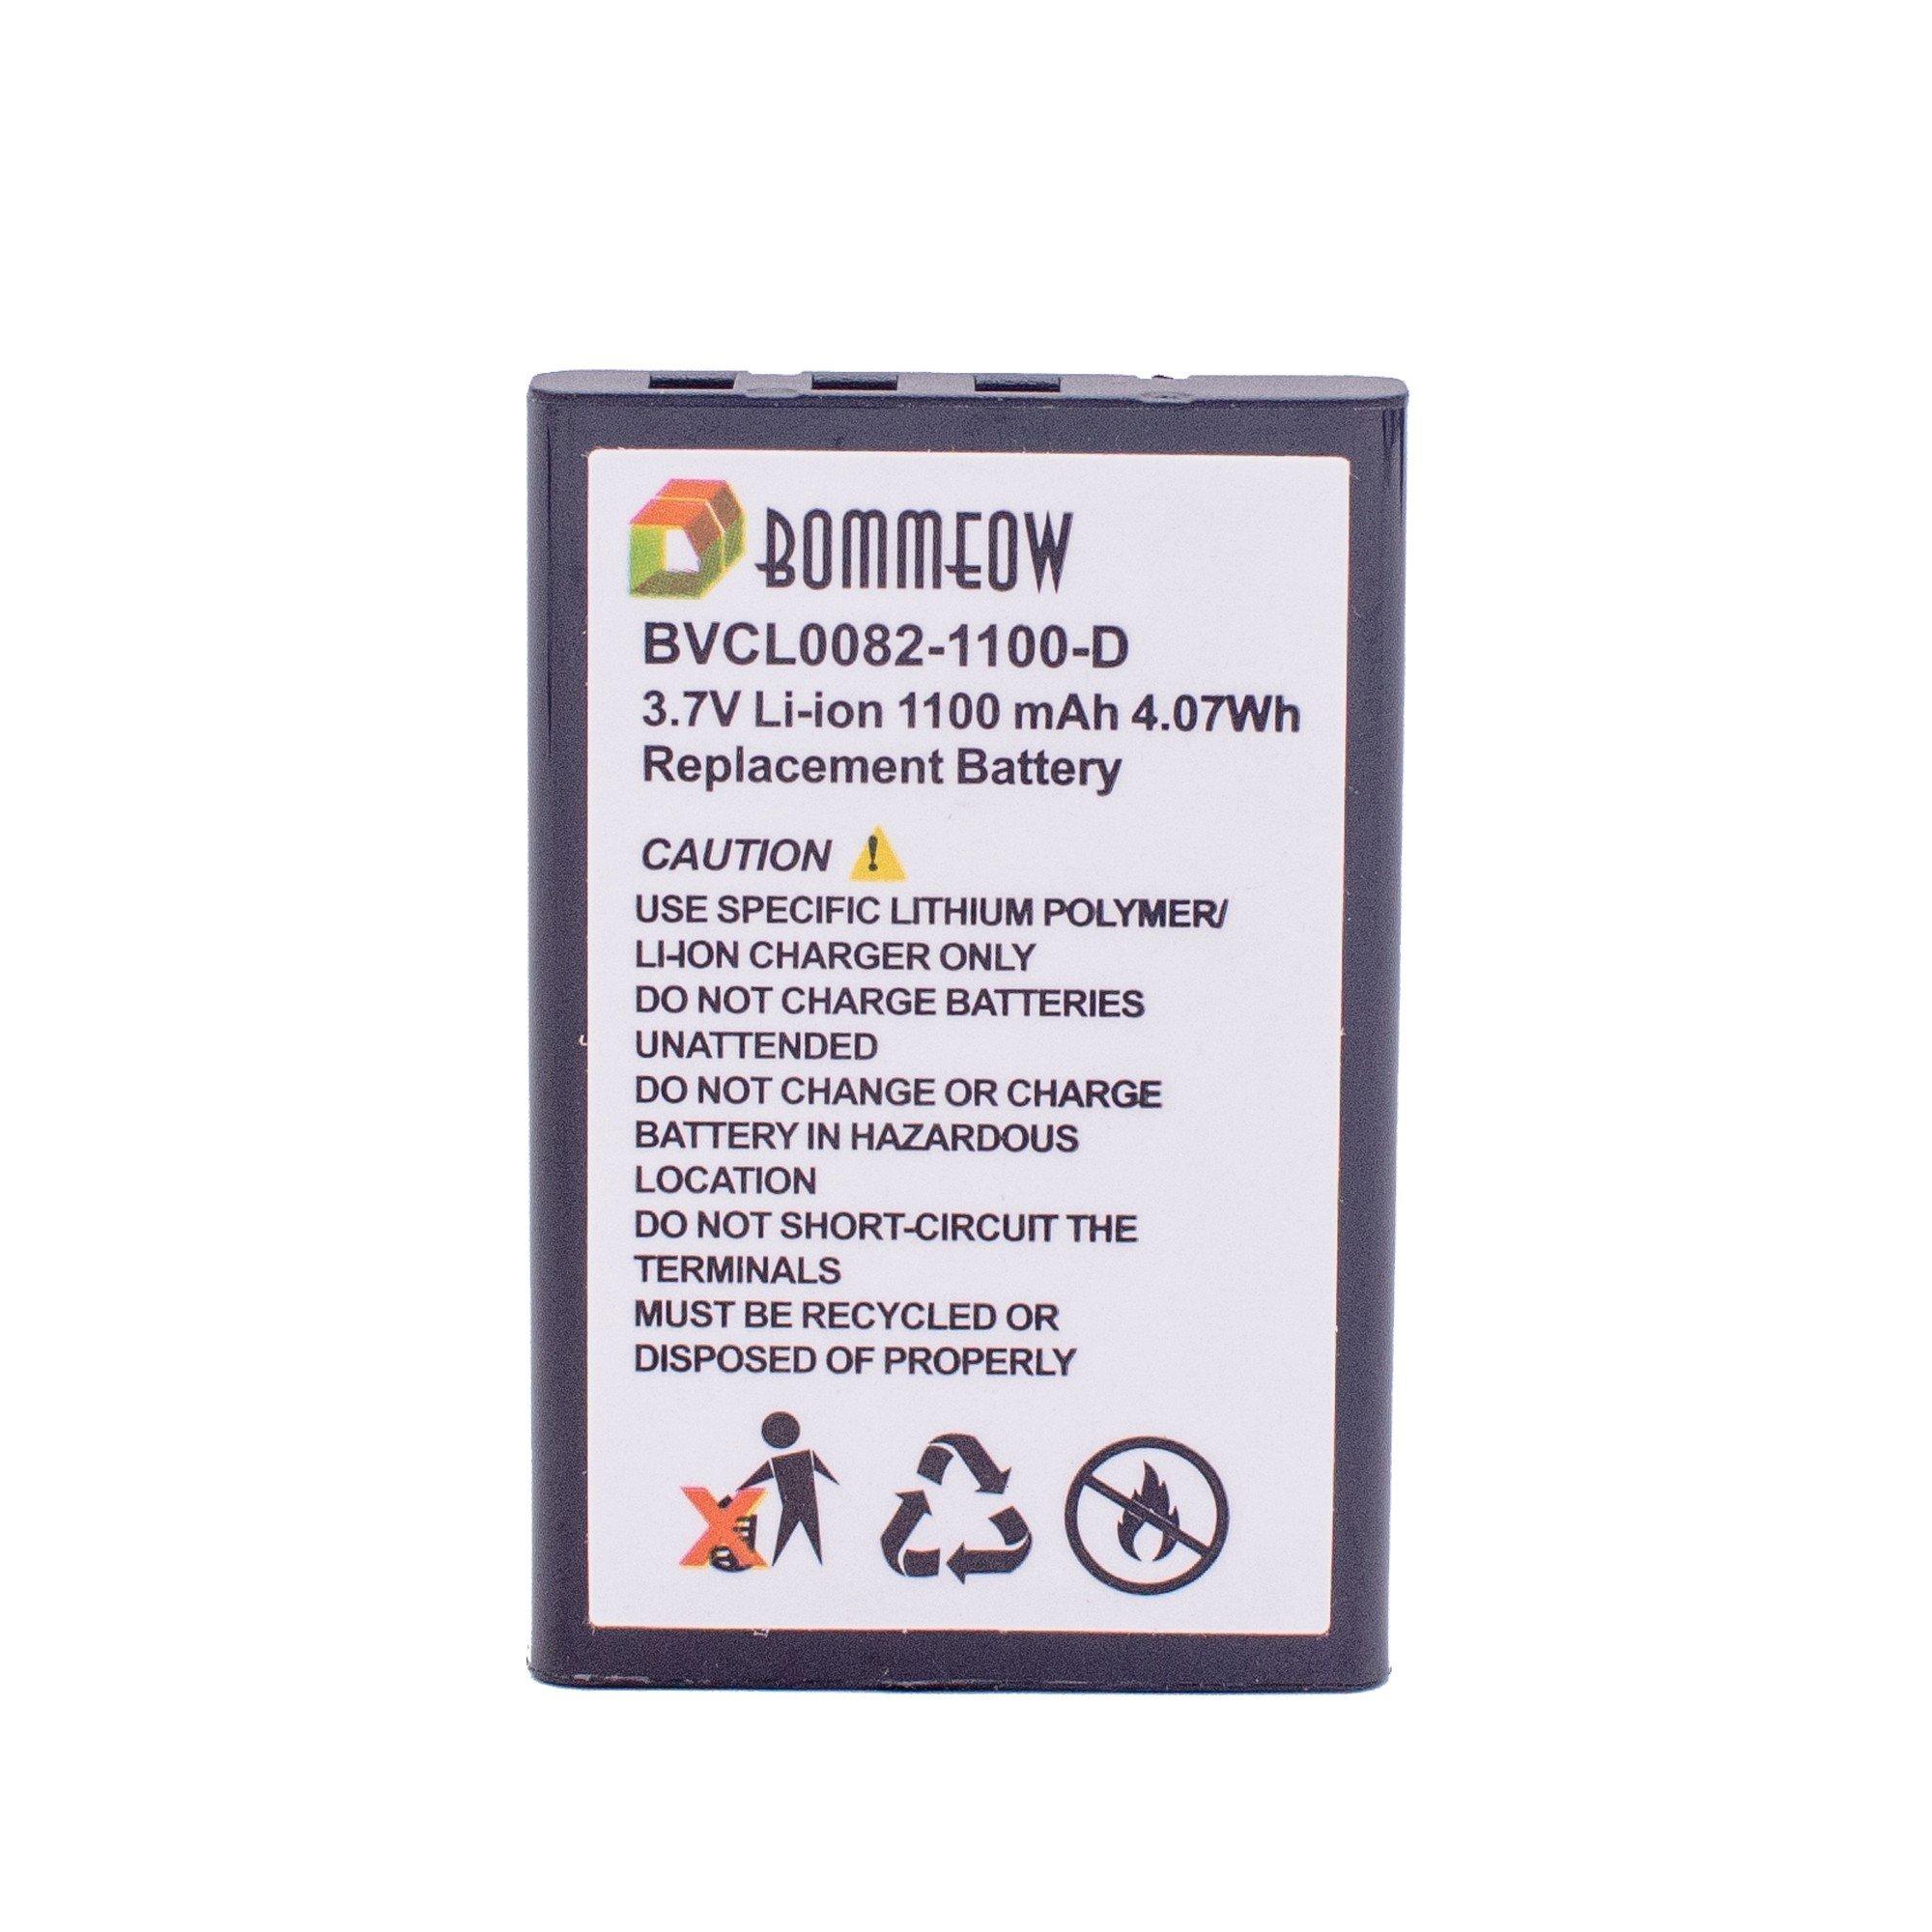 Bommeow BVCL0082-1100-D Replacement Battery for Yaesu VX-2 FT-2E VX-2R VX-3 VX-3R Radio